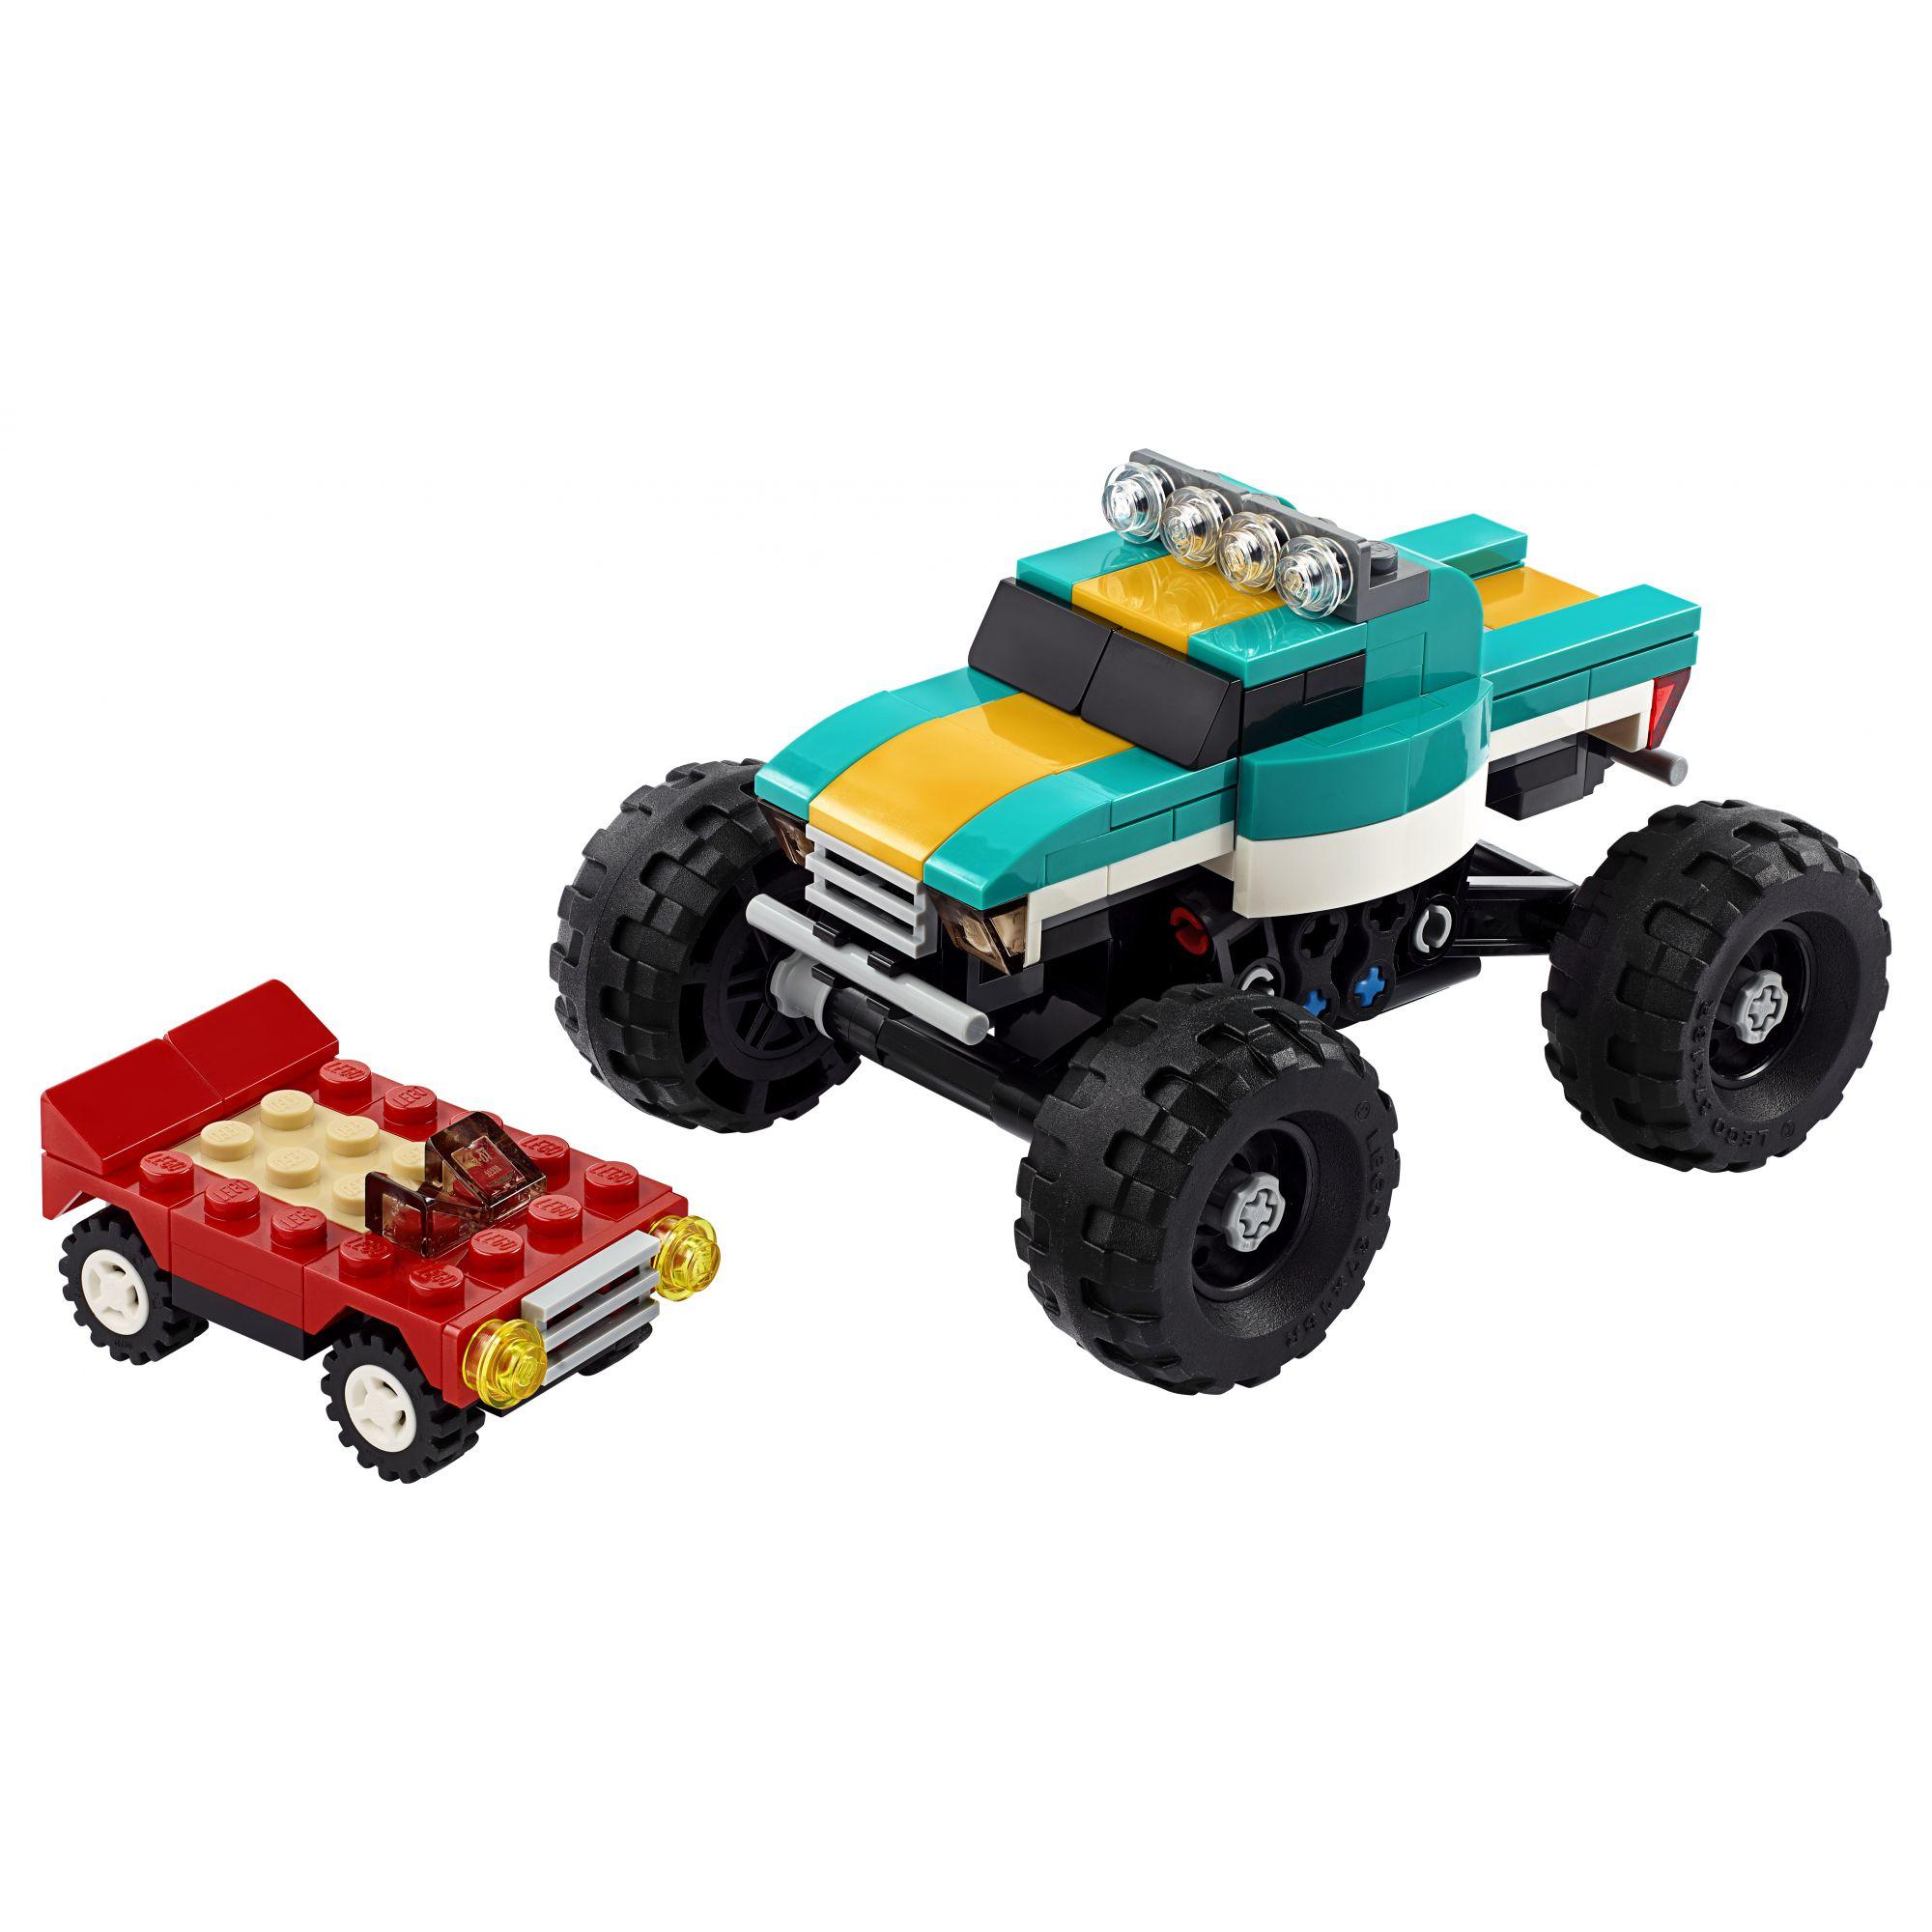 LEGO Creator Monster Truck - 31101    LEGO CREATOR